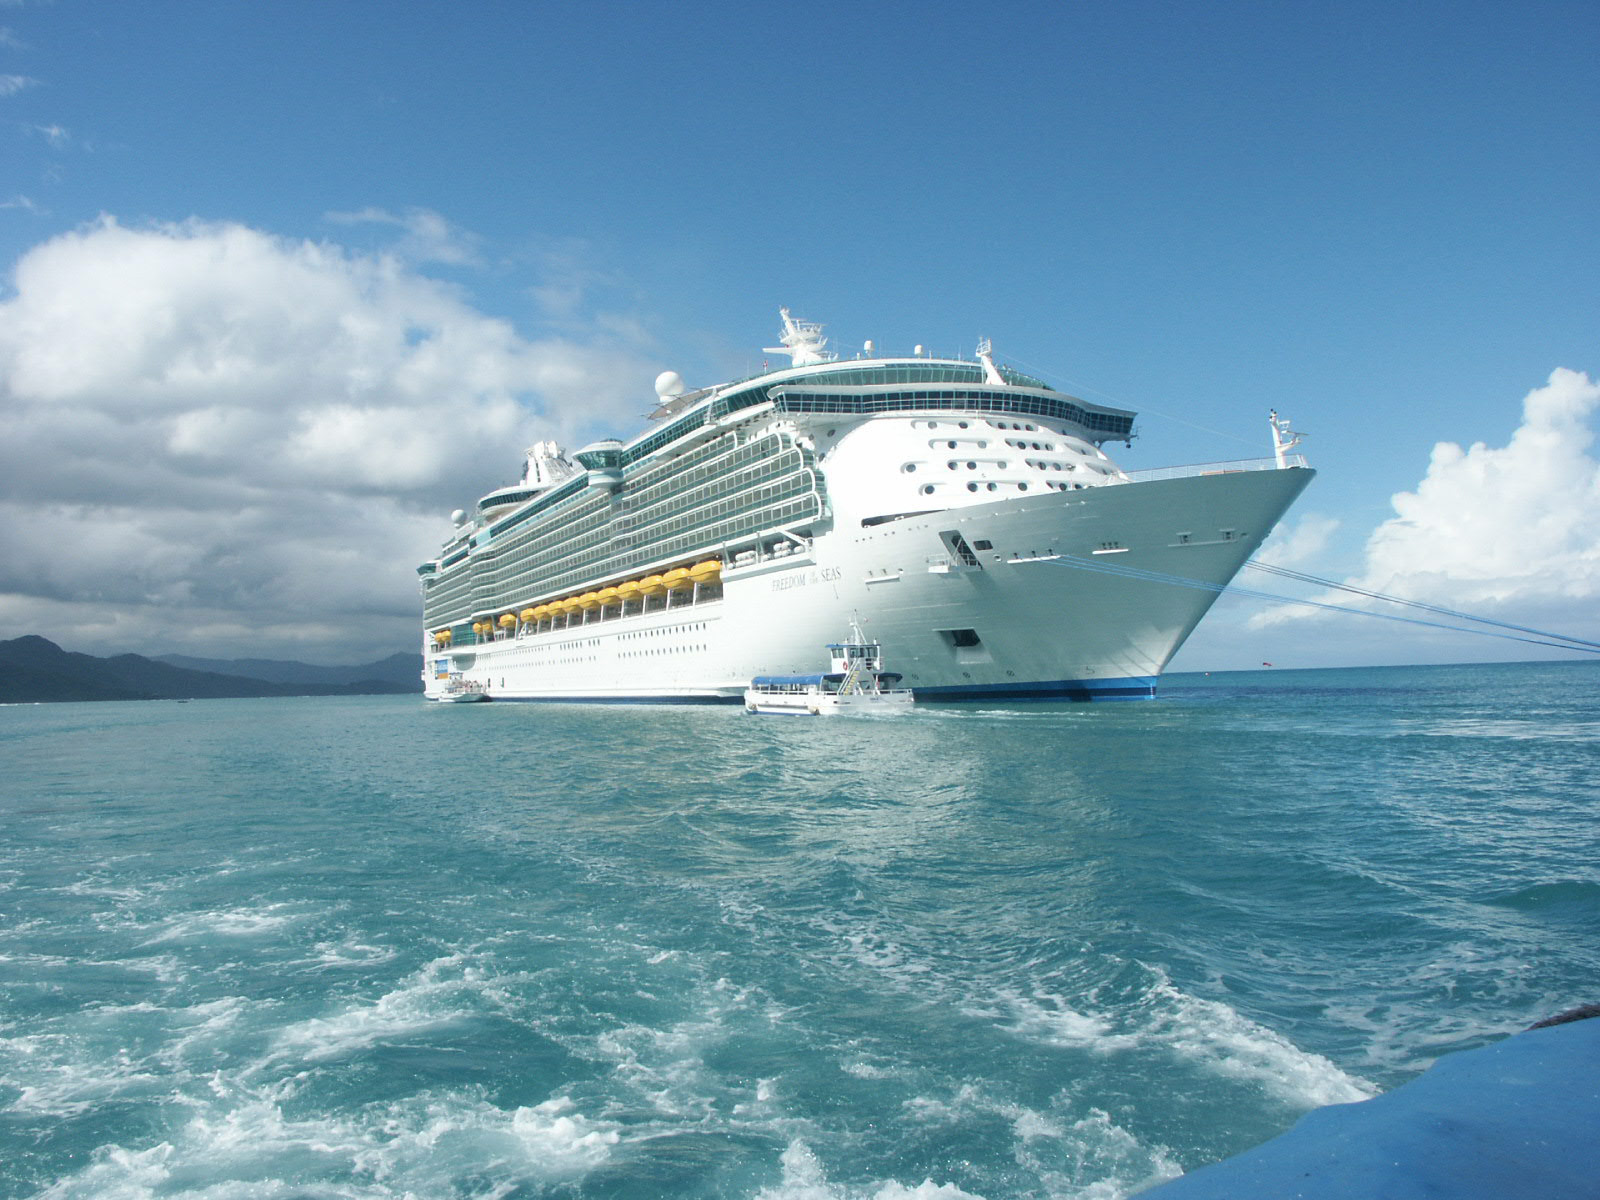 World Expensive Royal Caribbean Ship Wallpapers HD Wallpapers 1600x1200